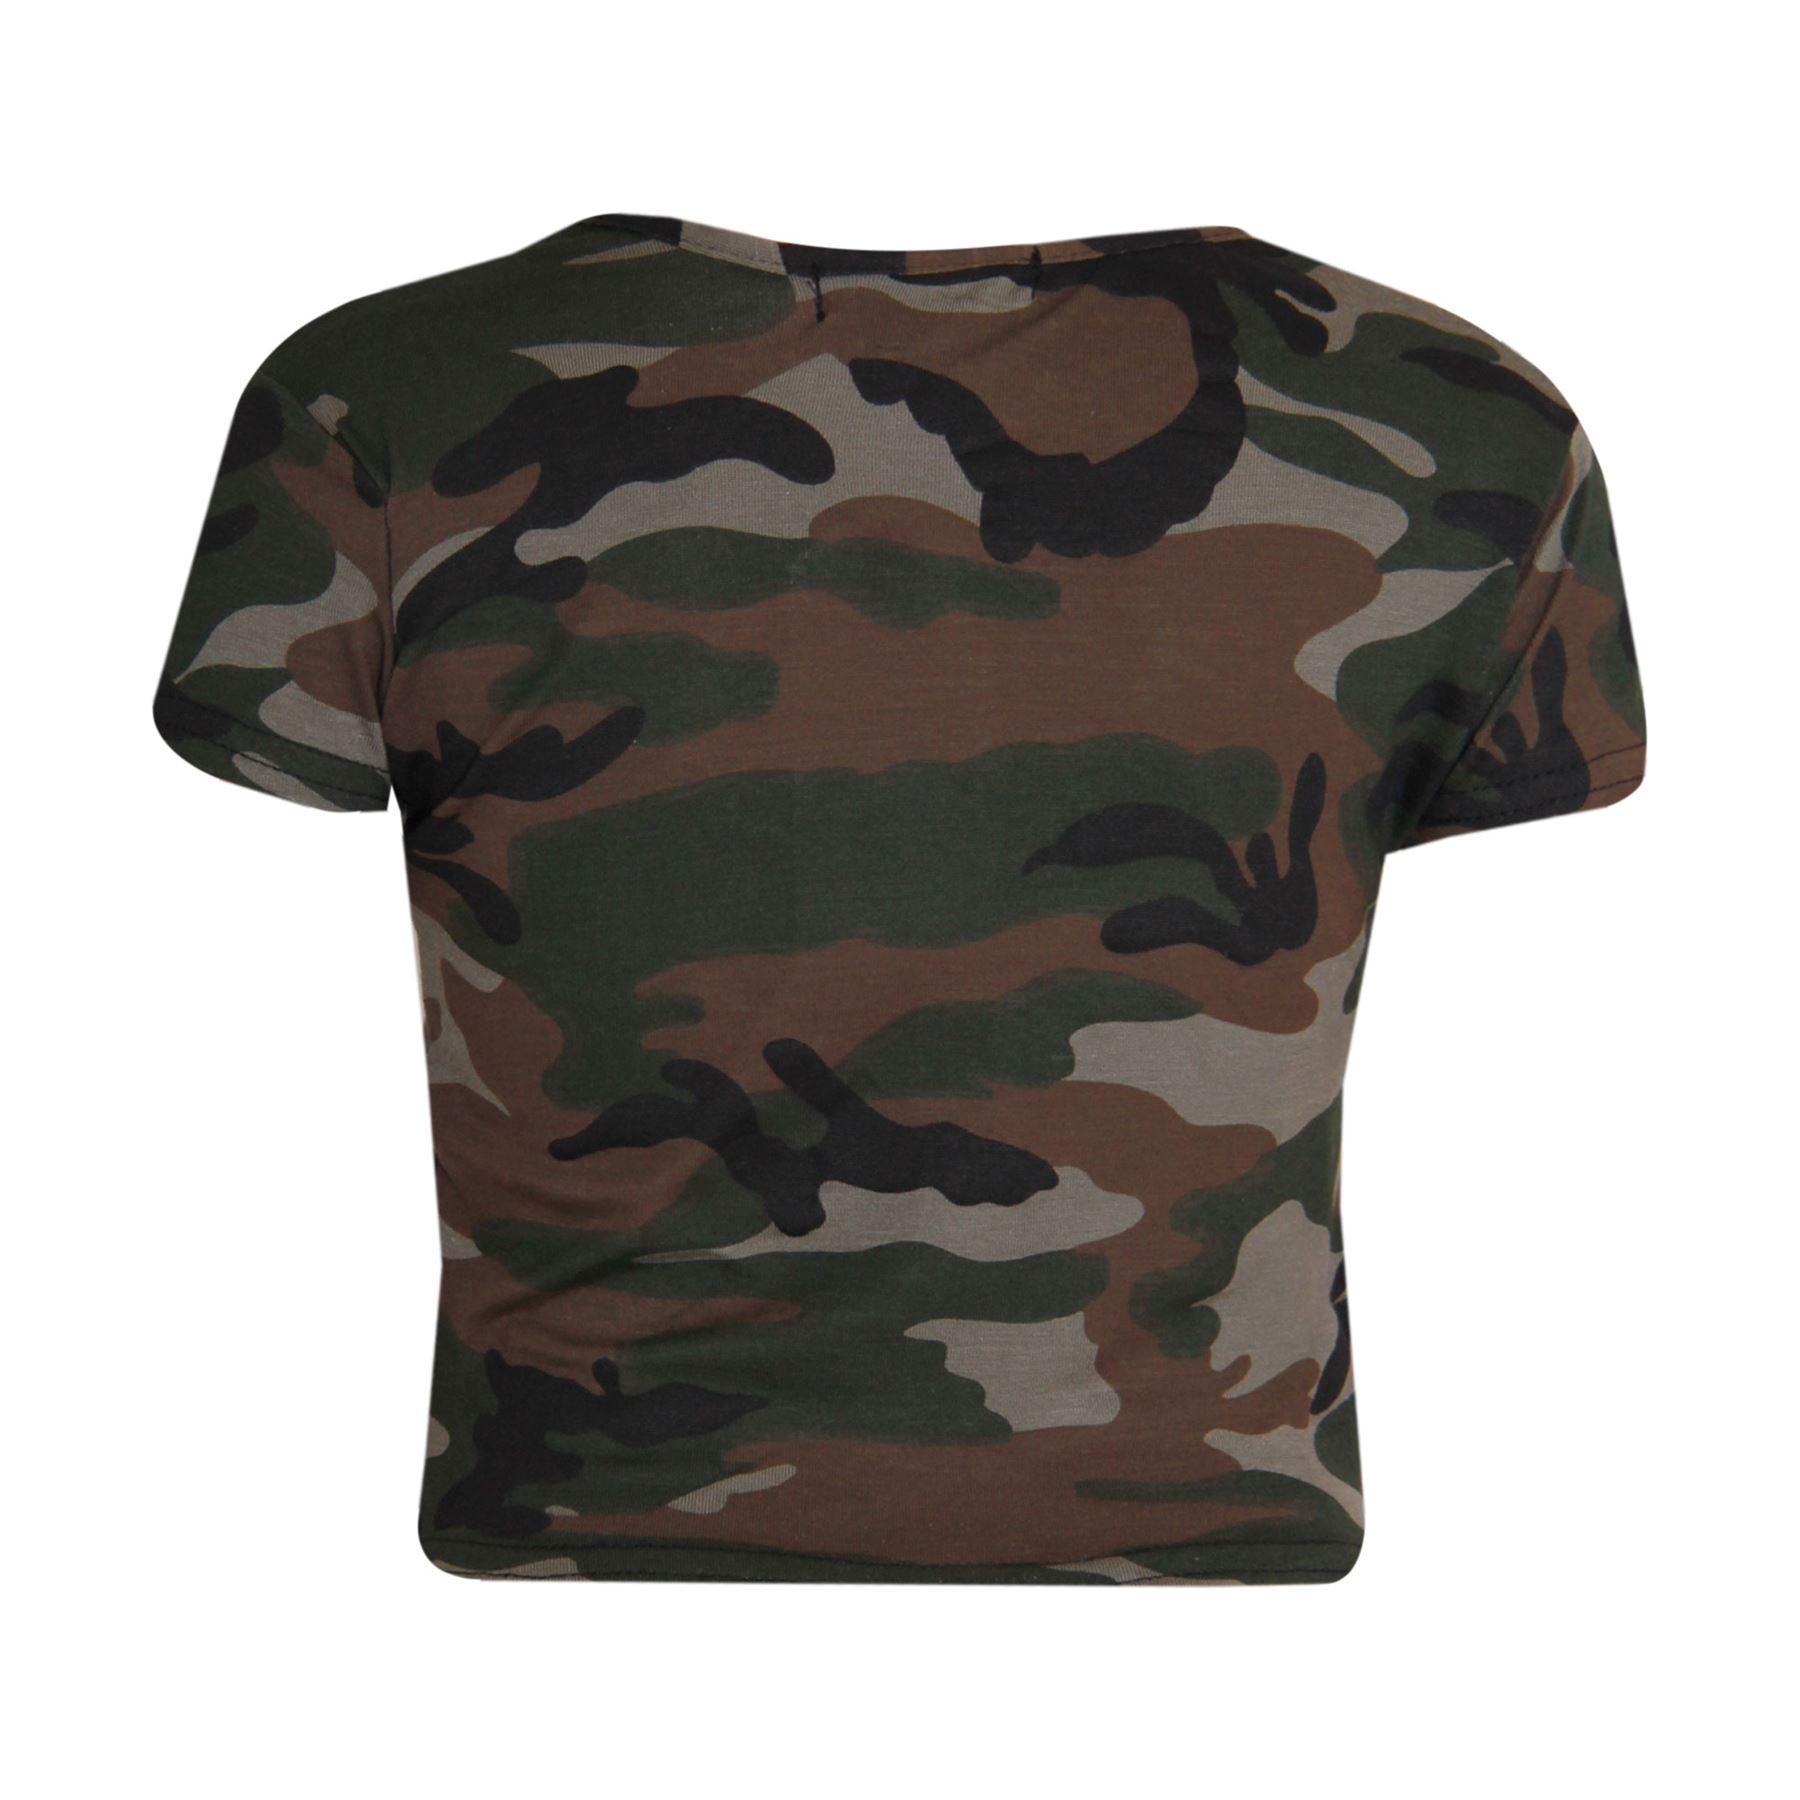 028b77eef94e4 Enfants Filles Nyc Camouflage Trendy Haut Court  amp  Mode Leggings ...